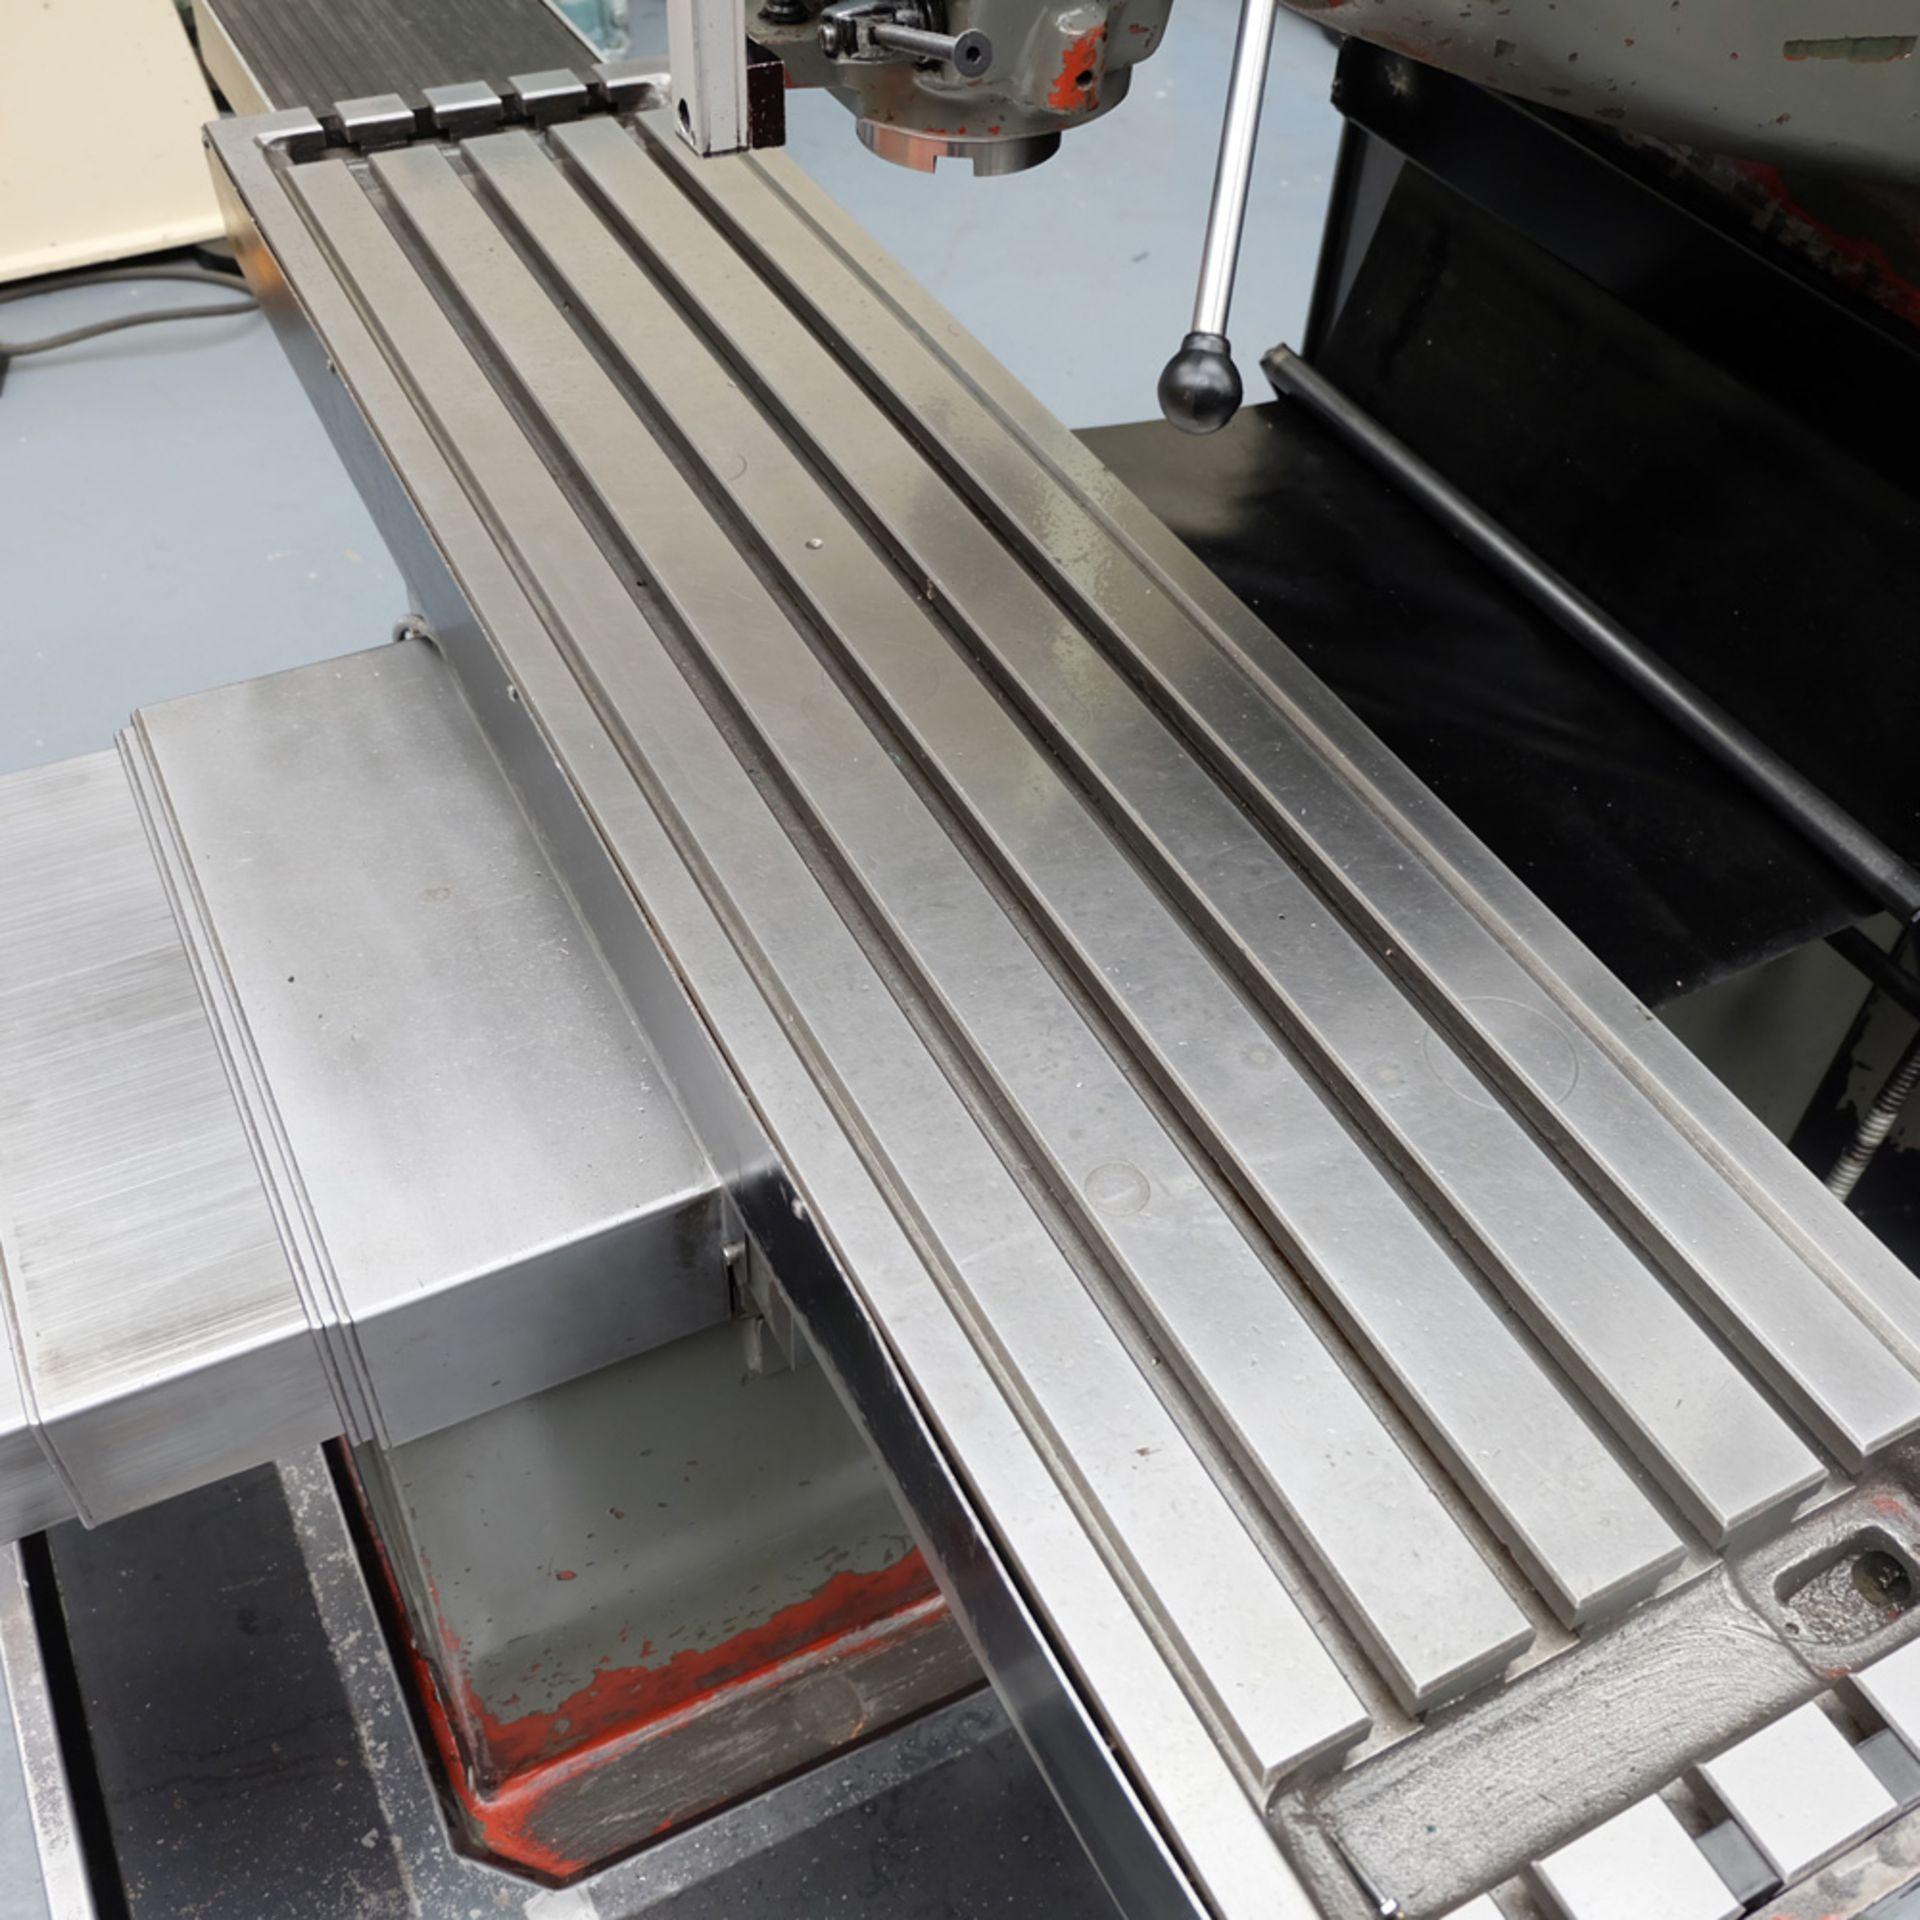 XYZ DPM Bed Mill with ProtoTRAK A.G.E. 3 Control. Prototrak A.G.E. - Image 7 of 10